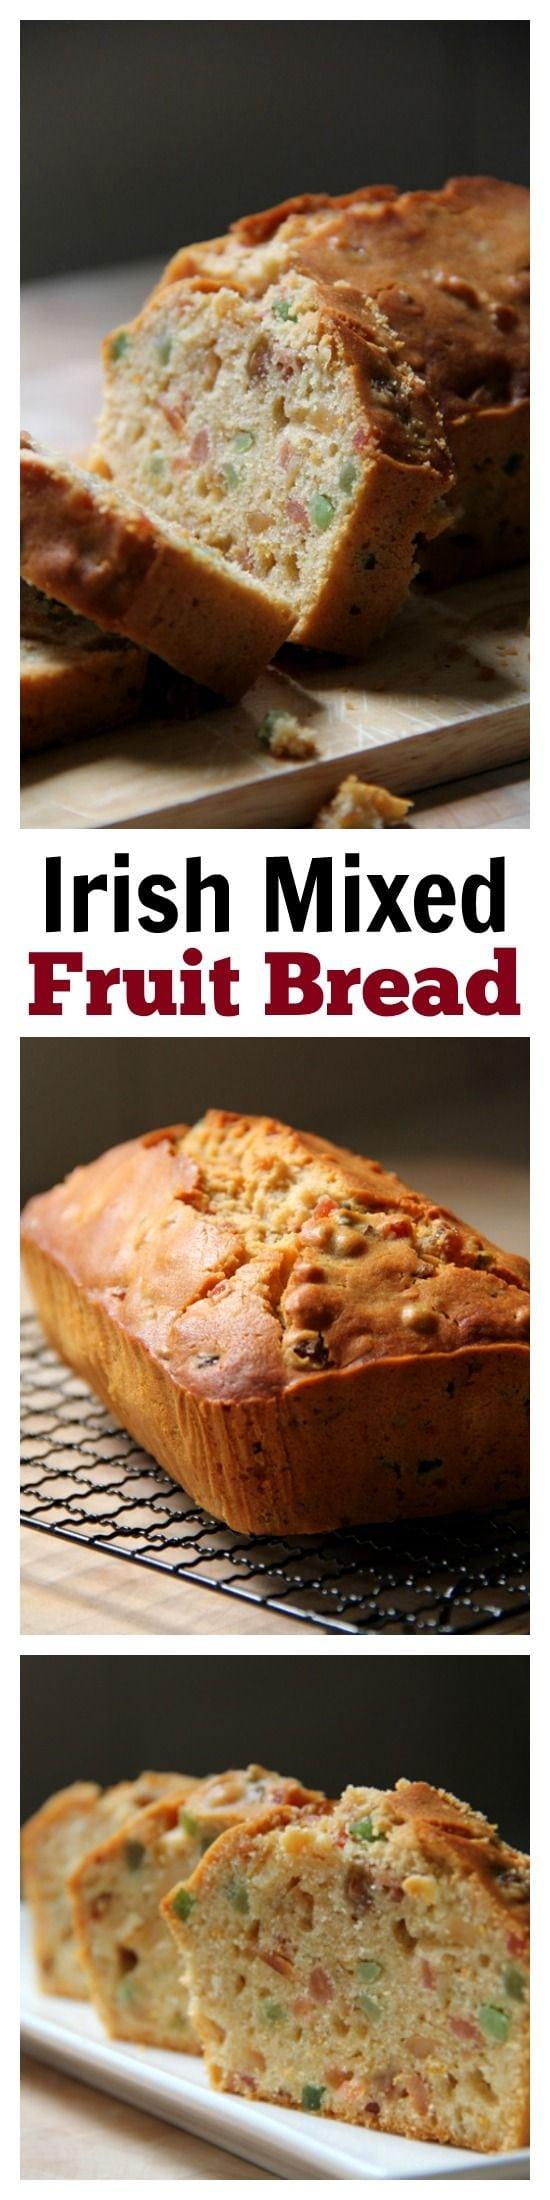 Irish Mixed Fruits Tea Bread - amazing afternoon tea bread recipe loaded with mixed fruits, so yummy   rasamalaysia.com